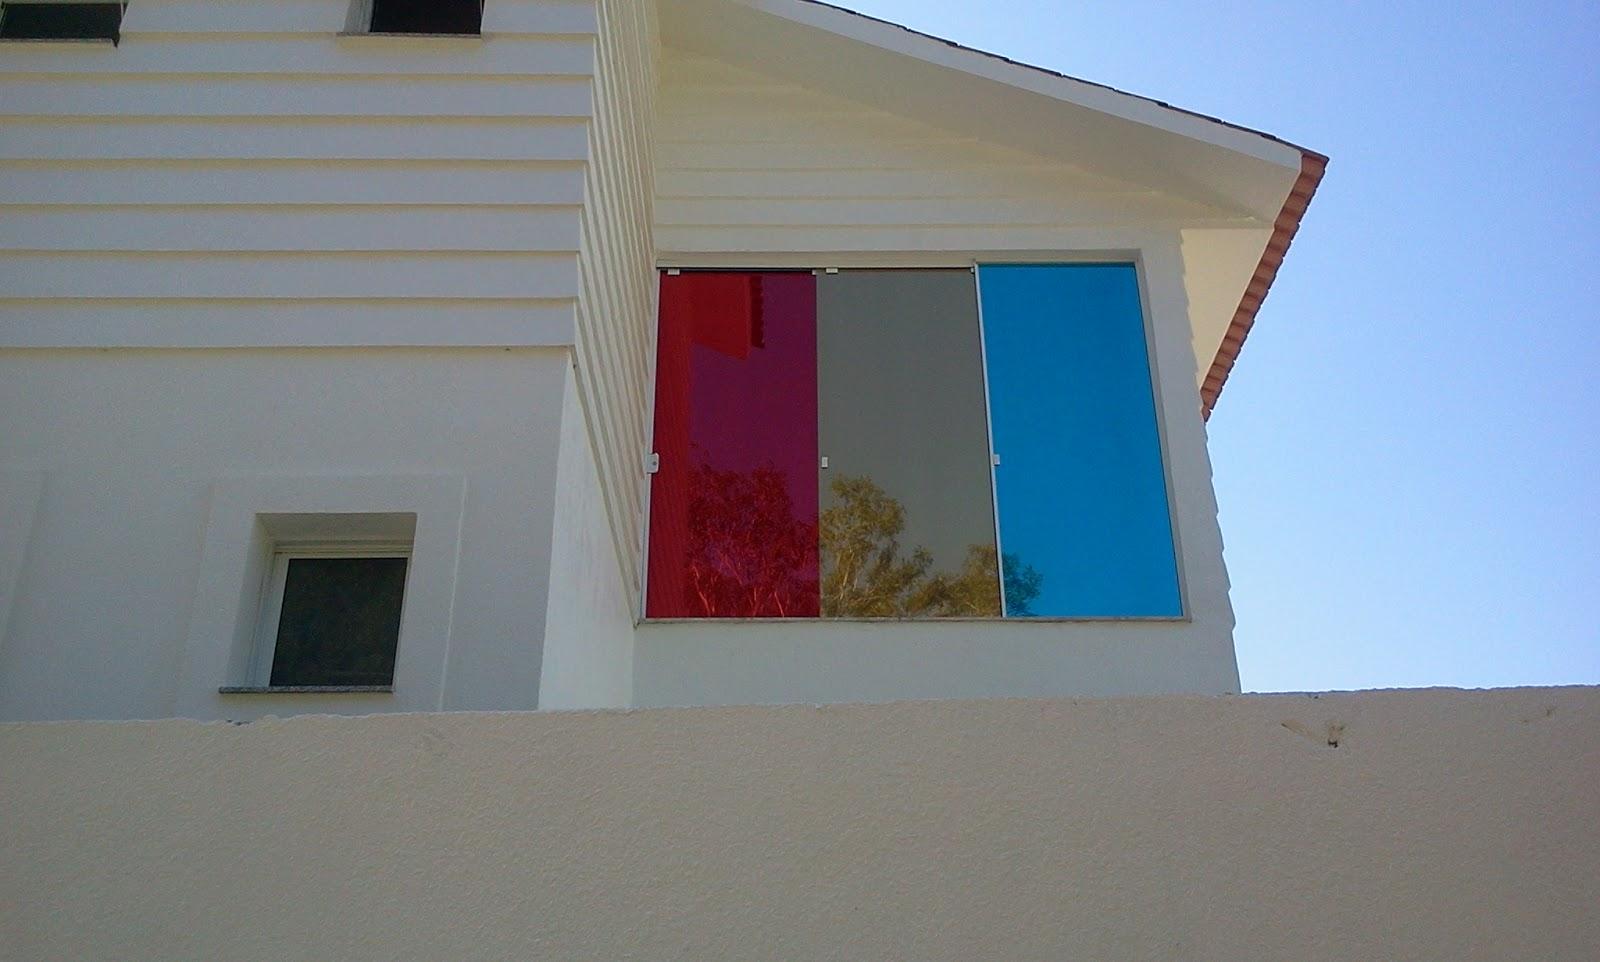 #0766C4 Construindo Minha Casa Clean: Película Residencial 738 Janelas Vidro Refletivo